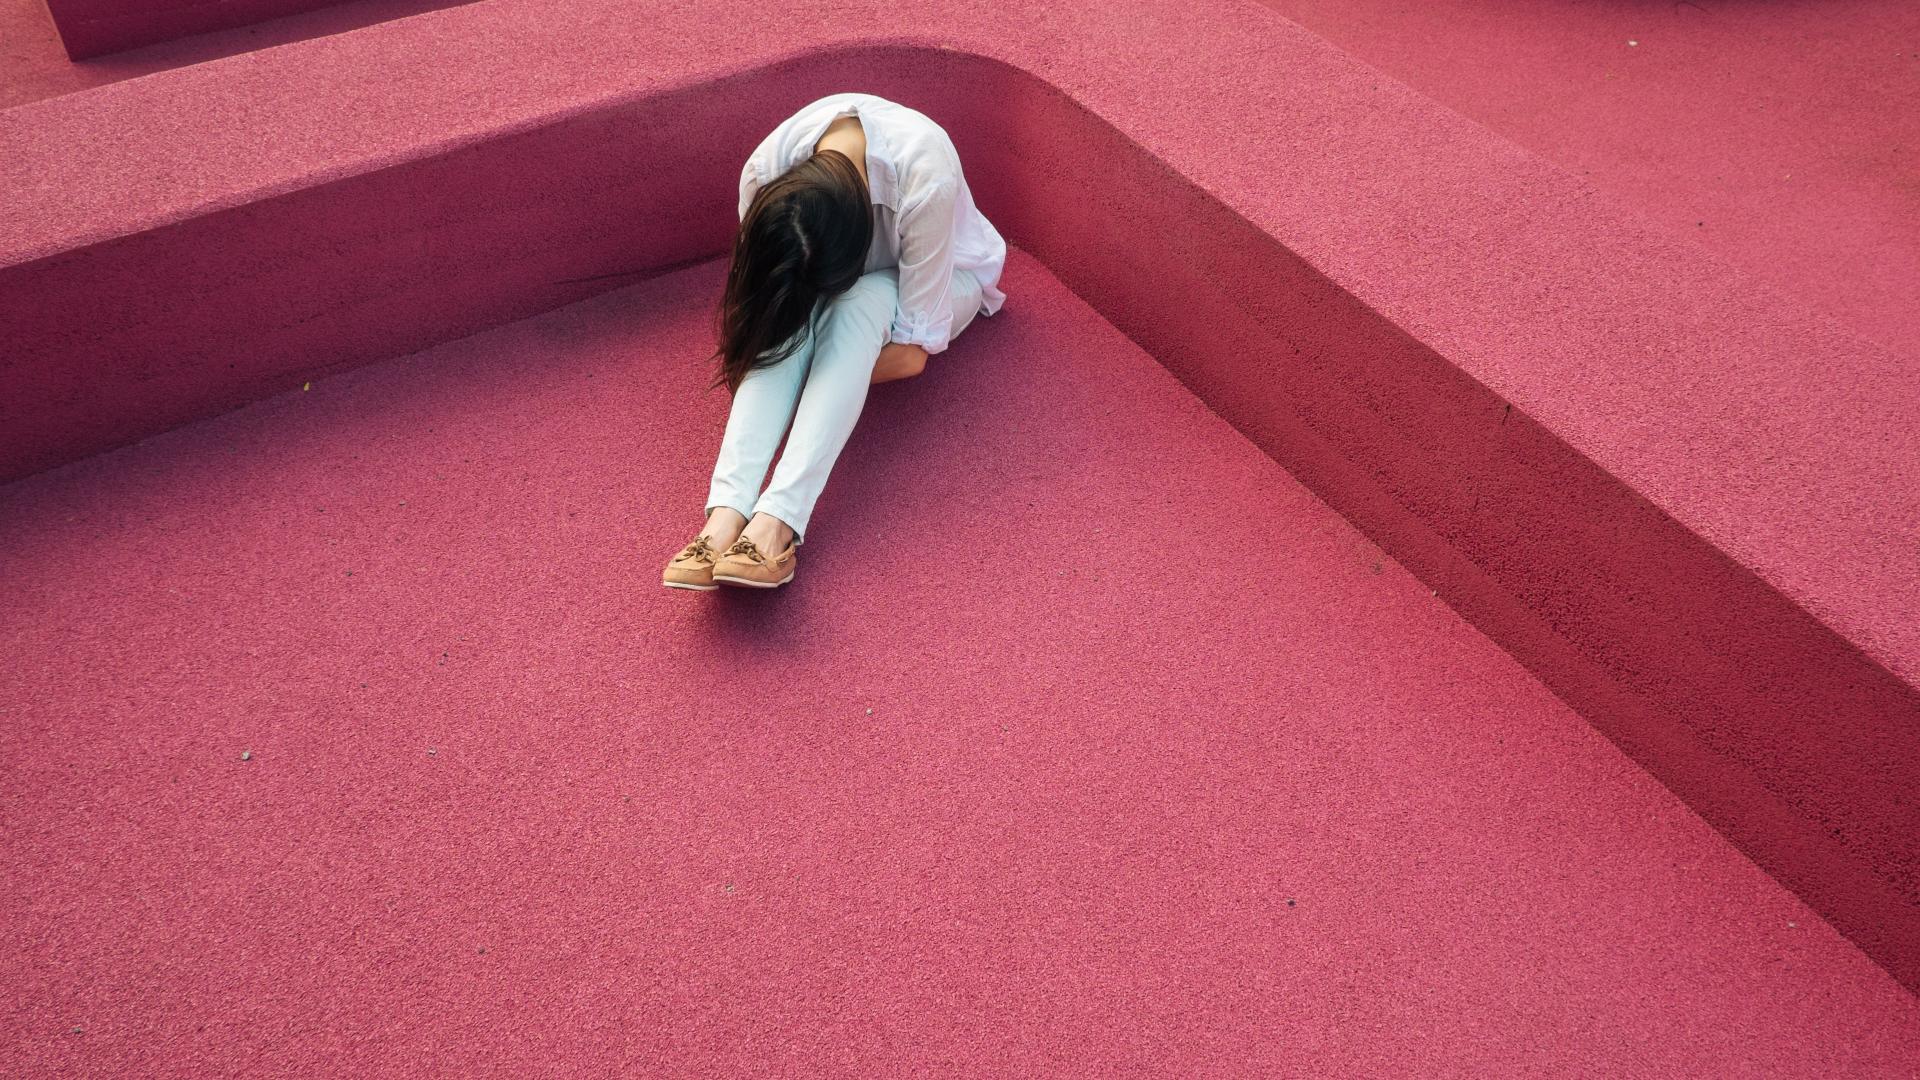 Frau auf Boden